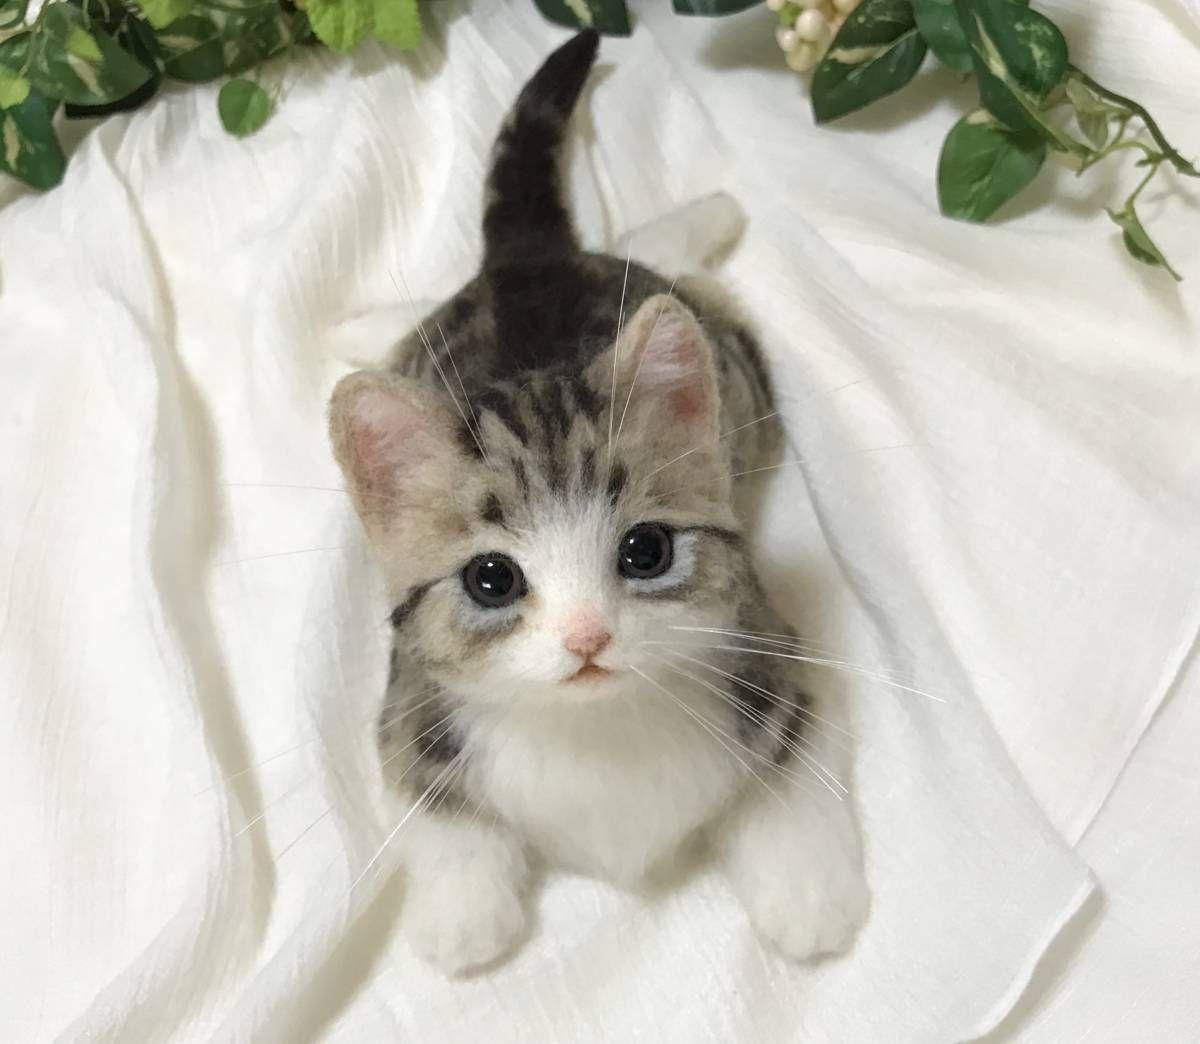 meiya ハンドメイド 羊毛フェルト マンチカンのかわいい子猫☆彡